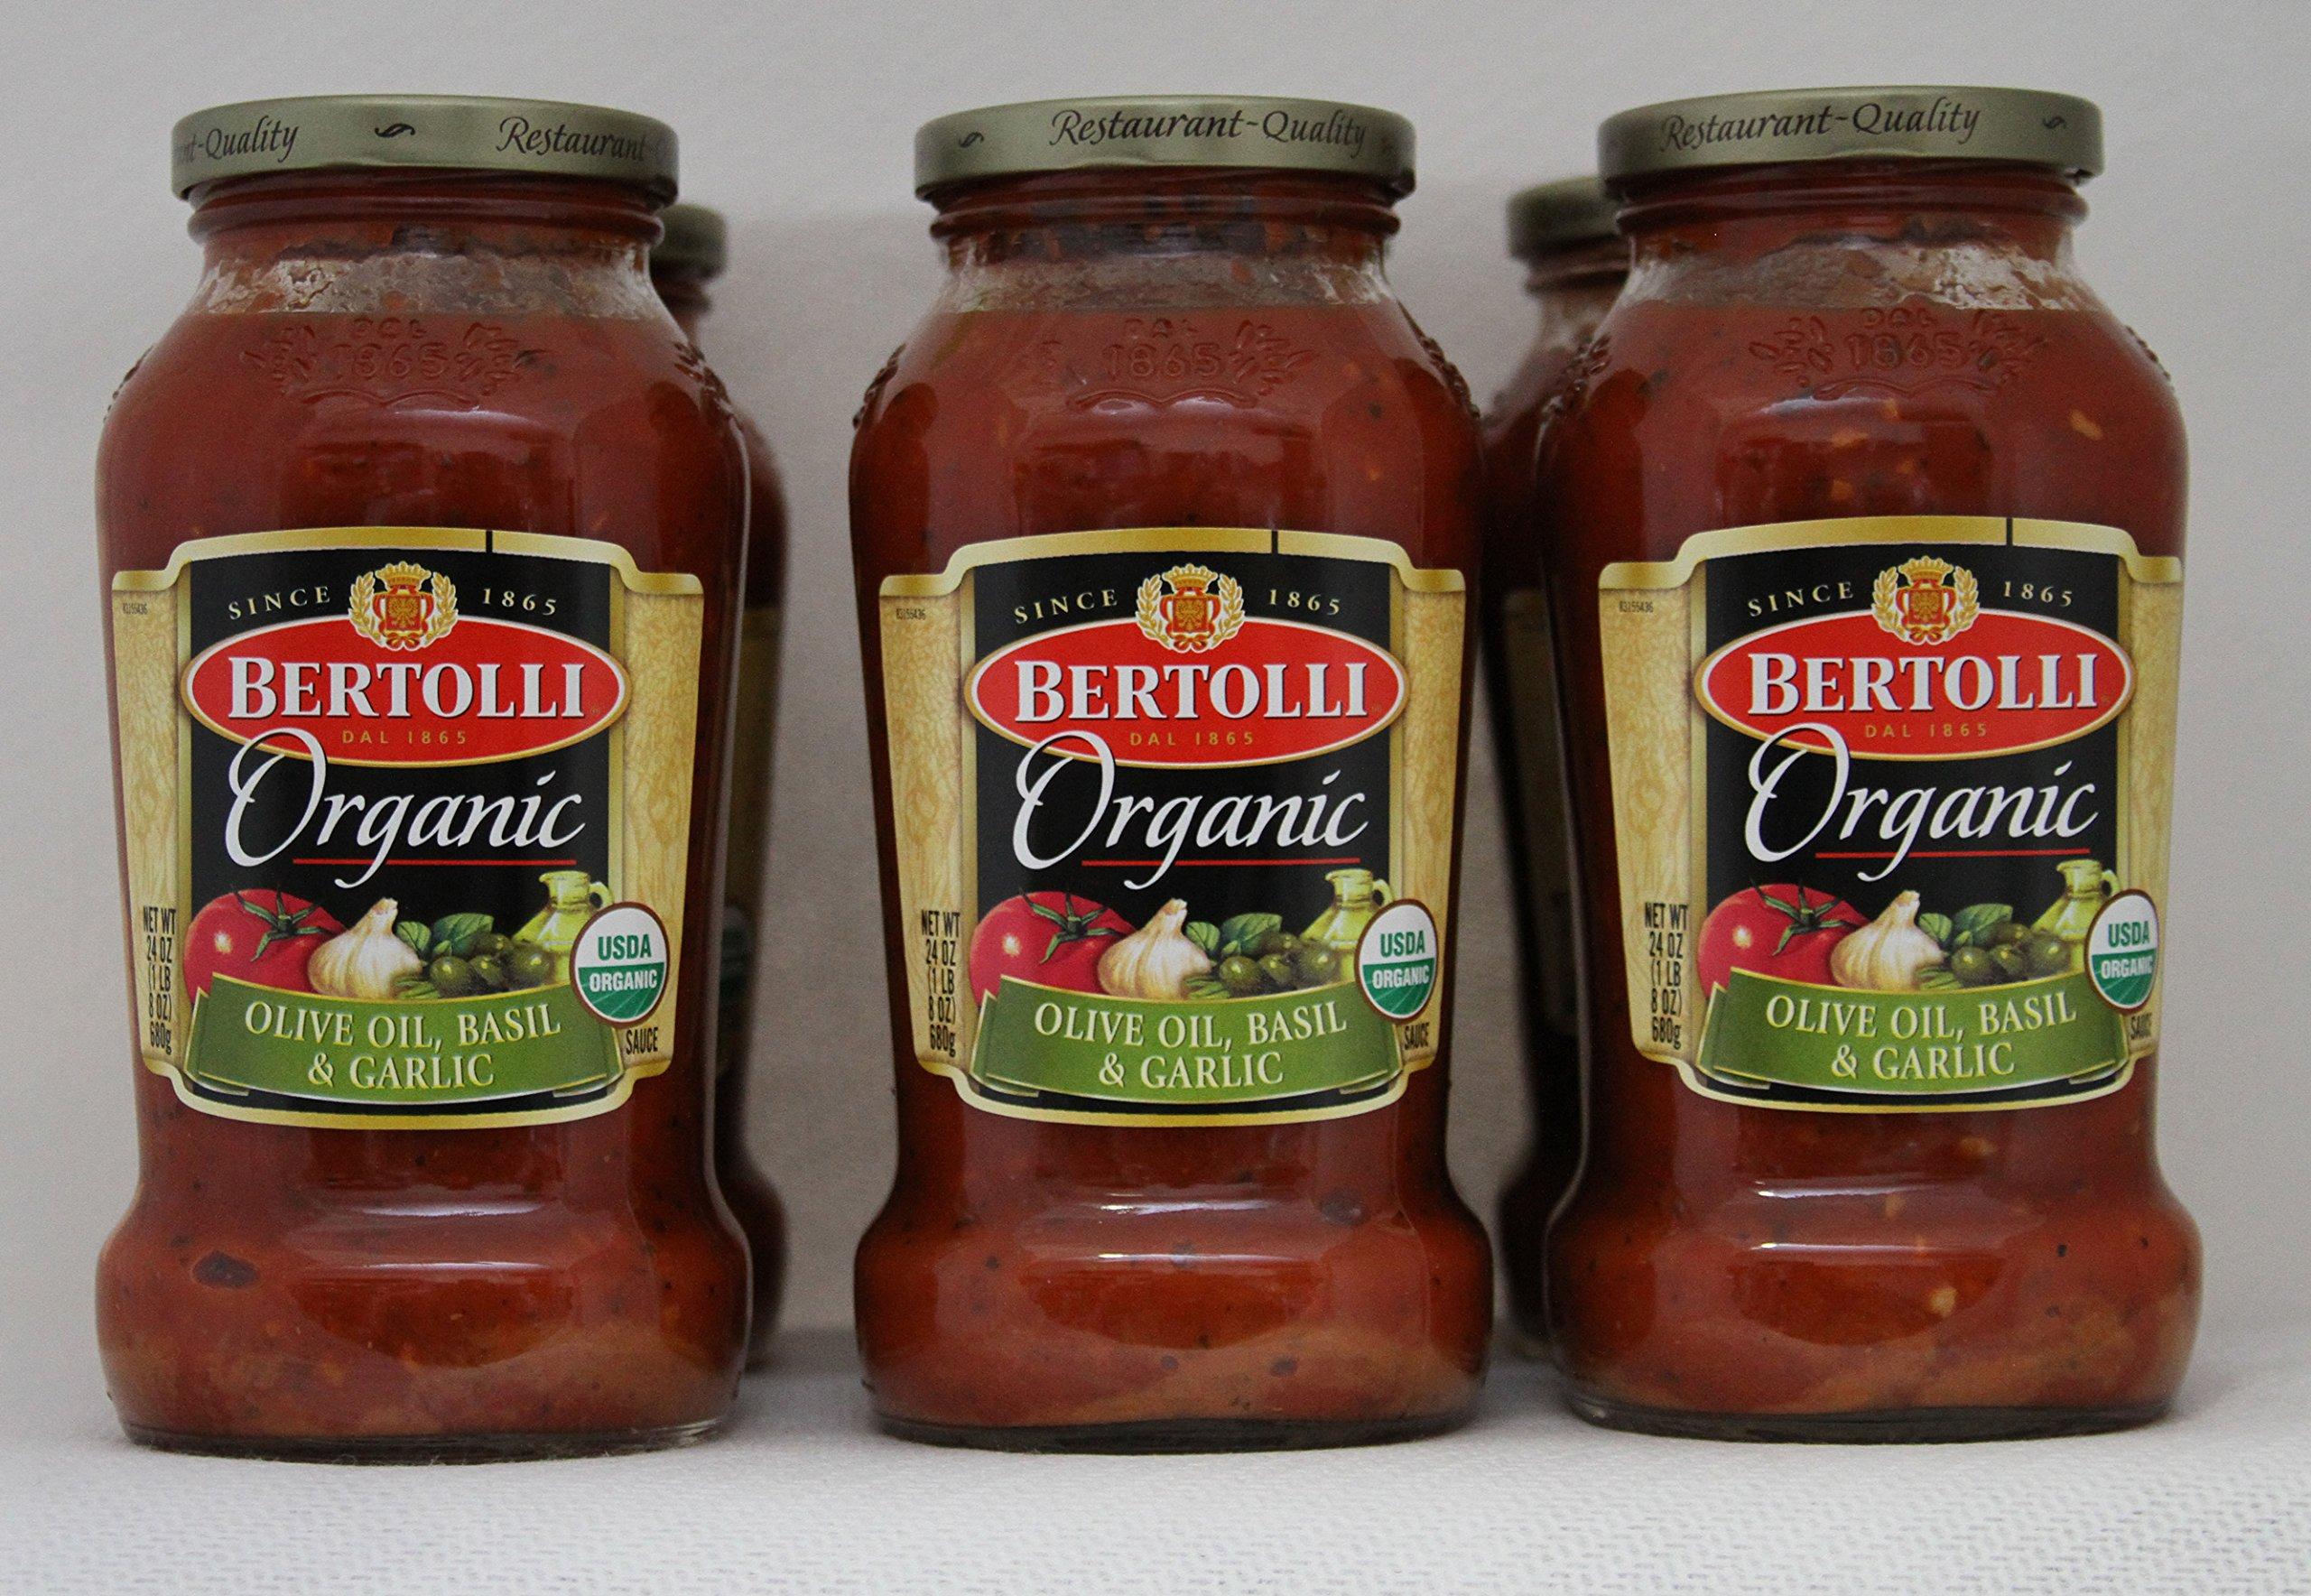 Bertolli - Olive Oil, Basil, & Garlic Organic Sauce 24 oz - 6 Pack